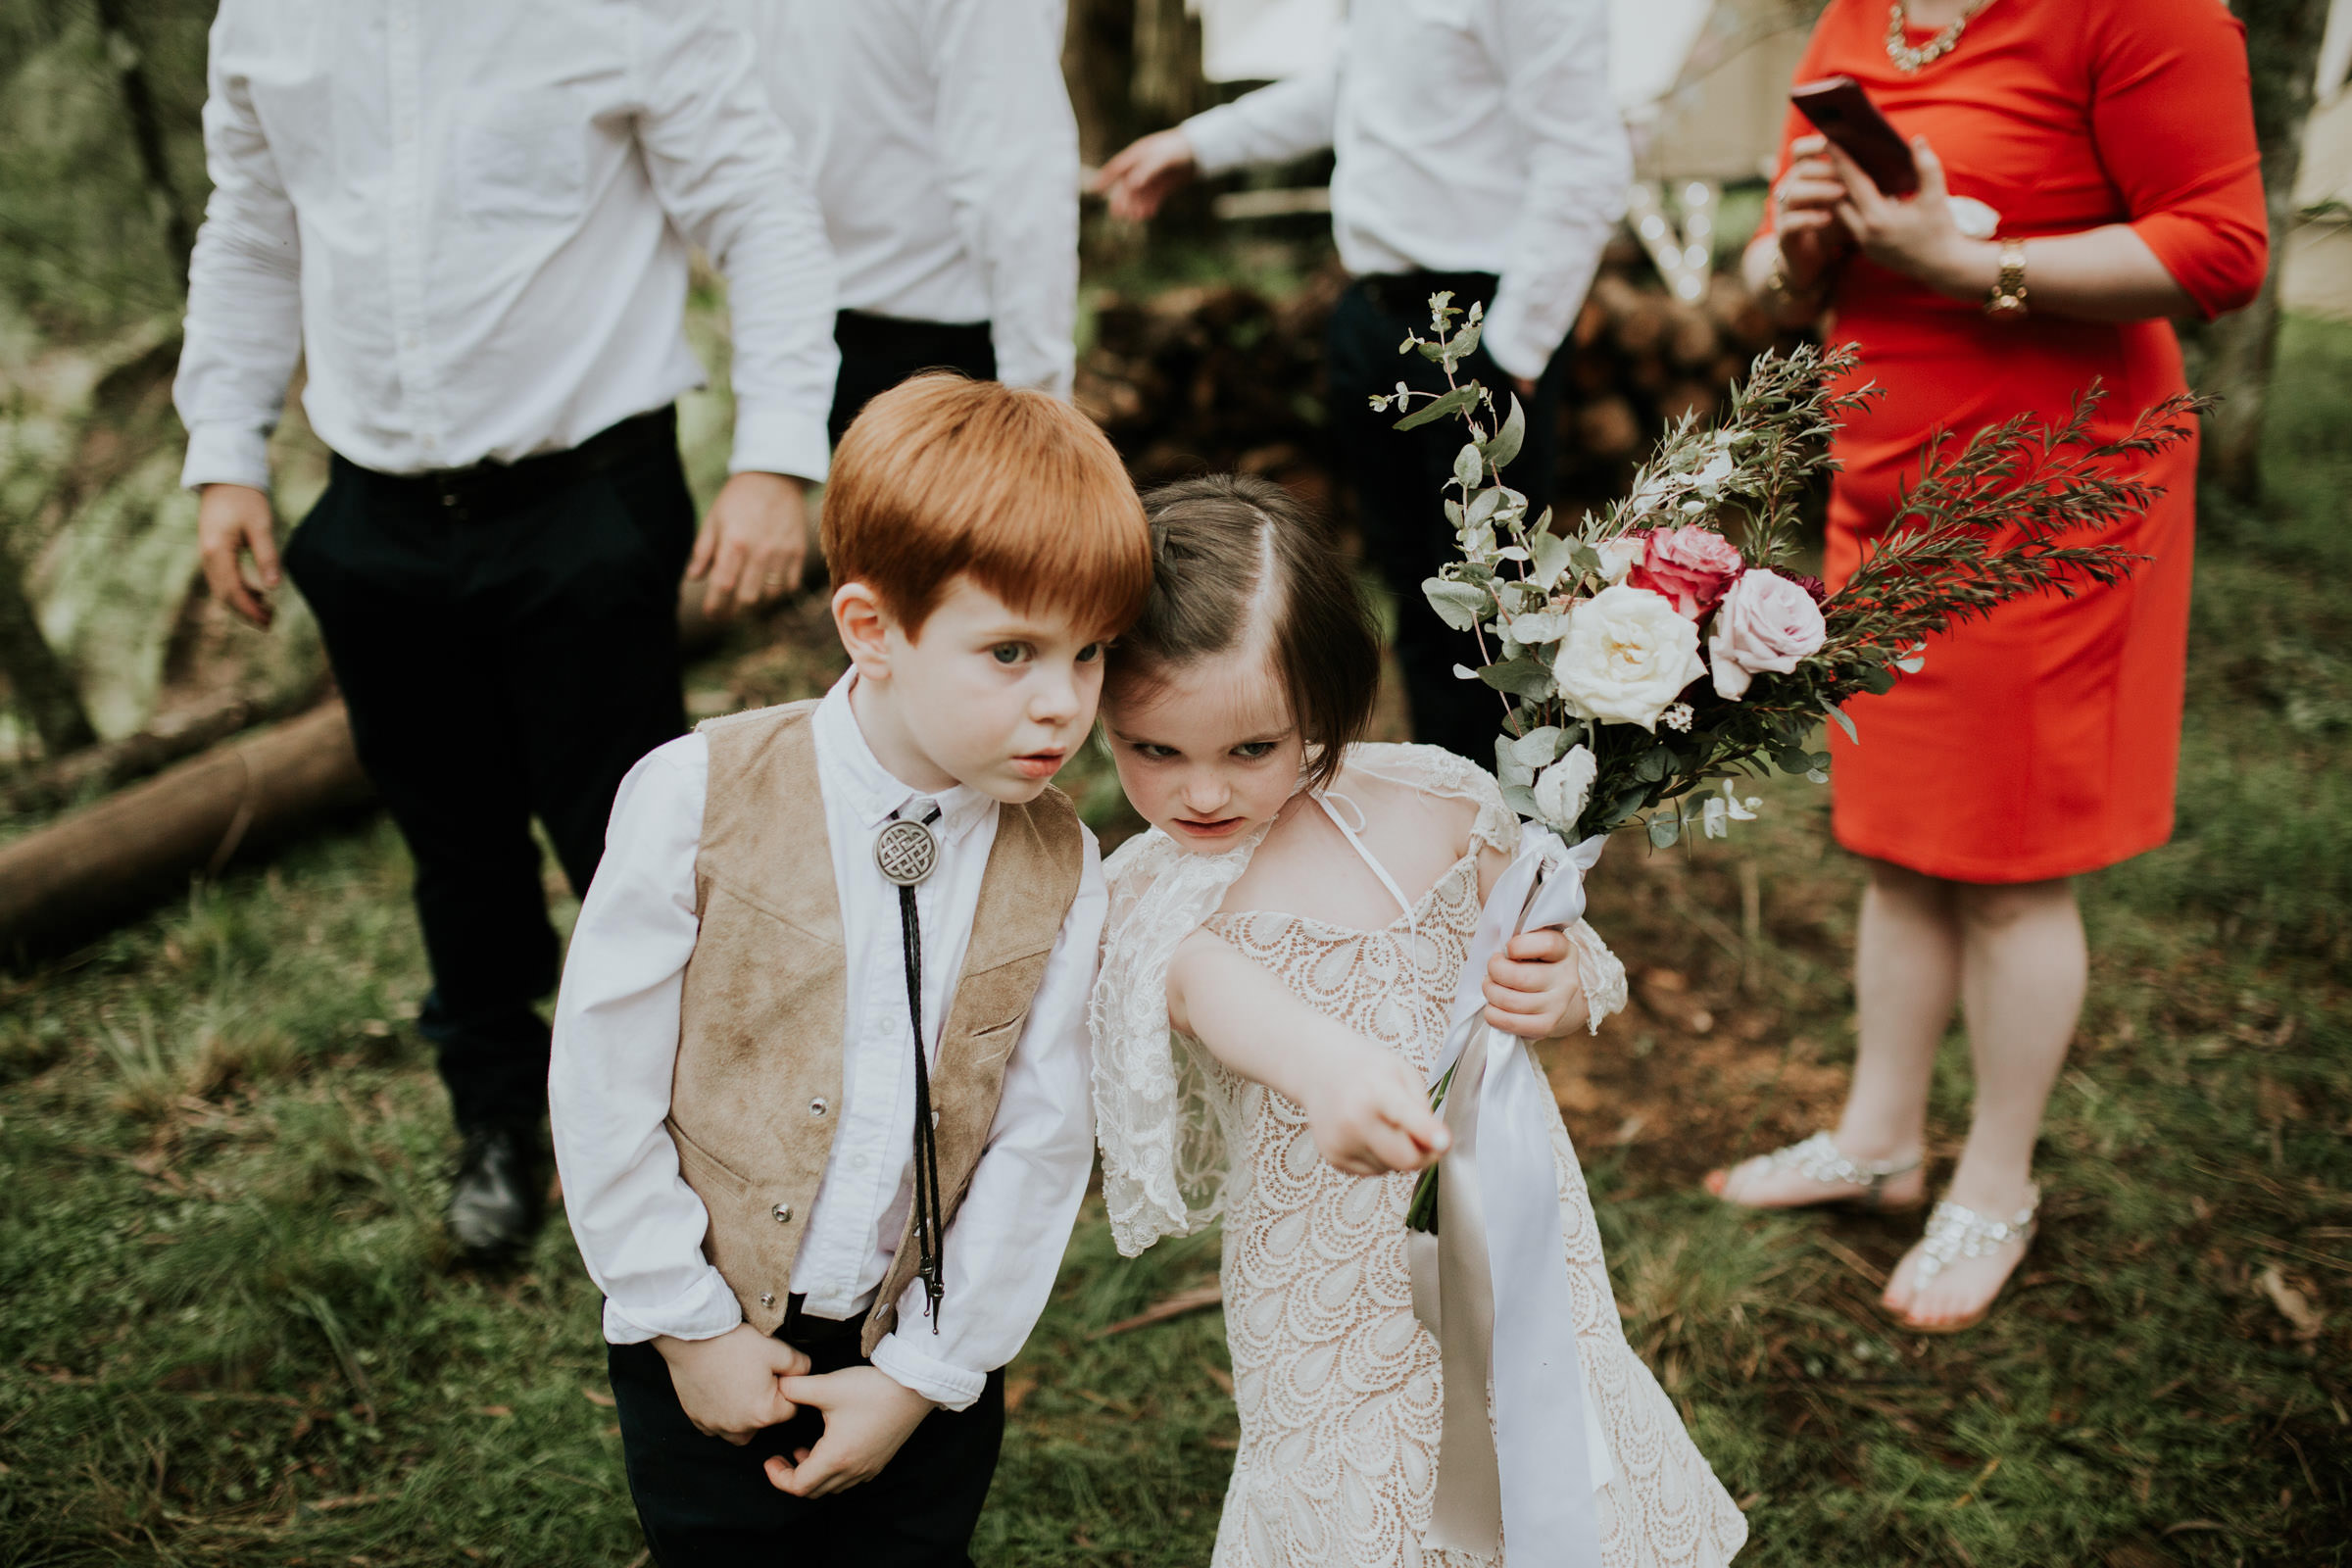 Emma+John+Far+South+Coast+Wedding+Festivl+Glamping+Bush-109.jpg